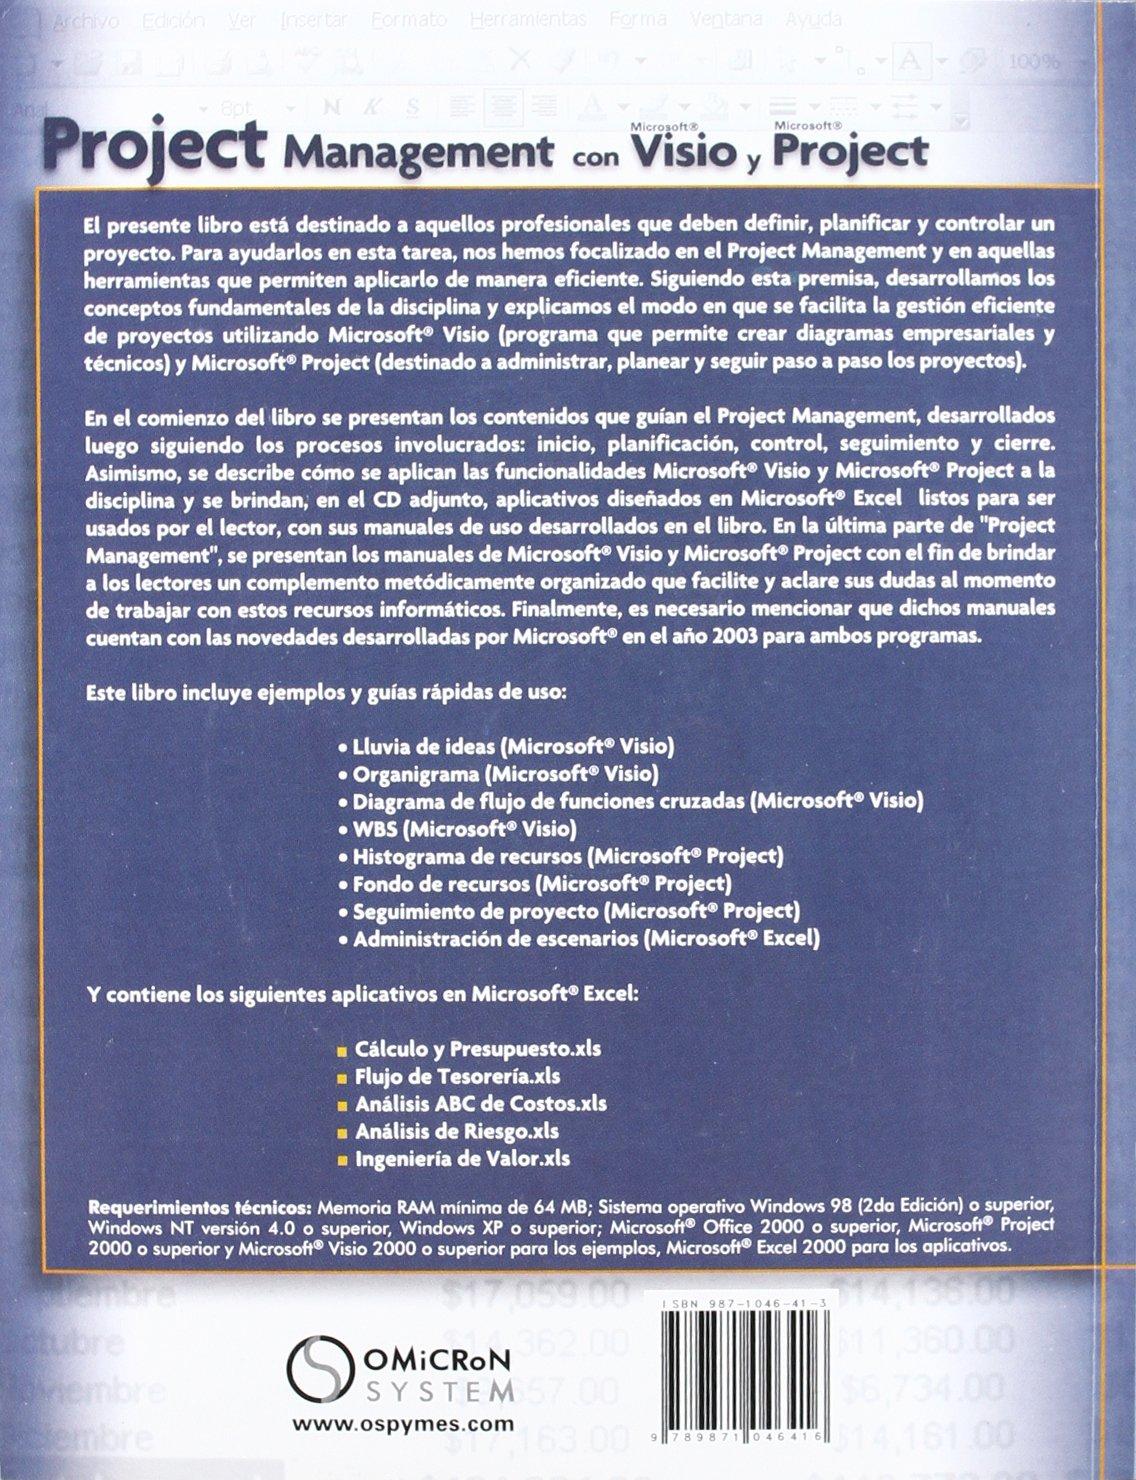 Project management con microsoft visio y microsoft project spanish project management con microsoft visio y microsoft project spanish edition veronica garcia fronti 9789871046416 amazon books ccuart Choice Image